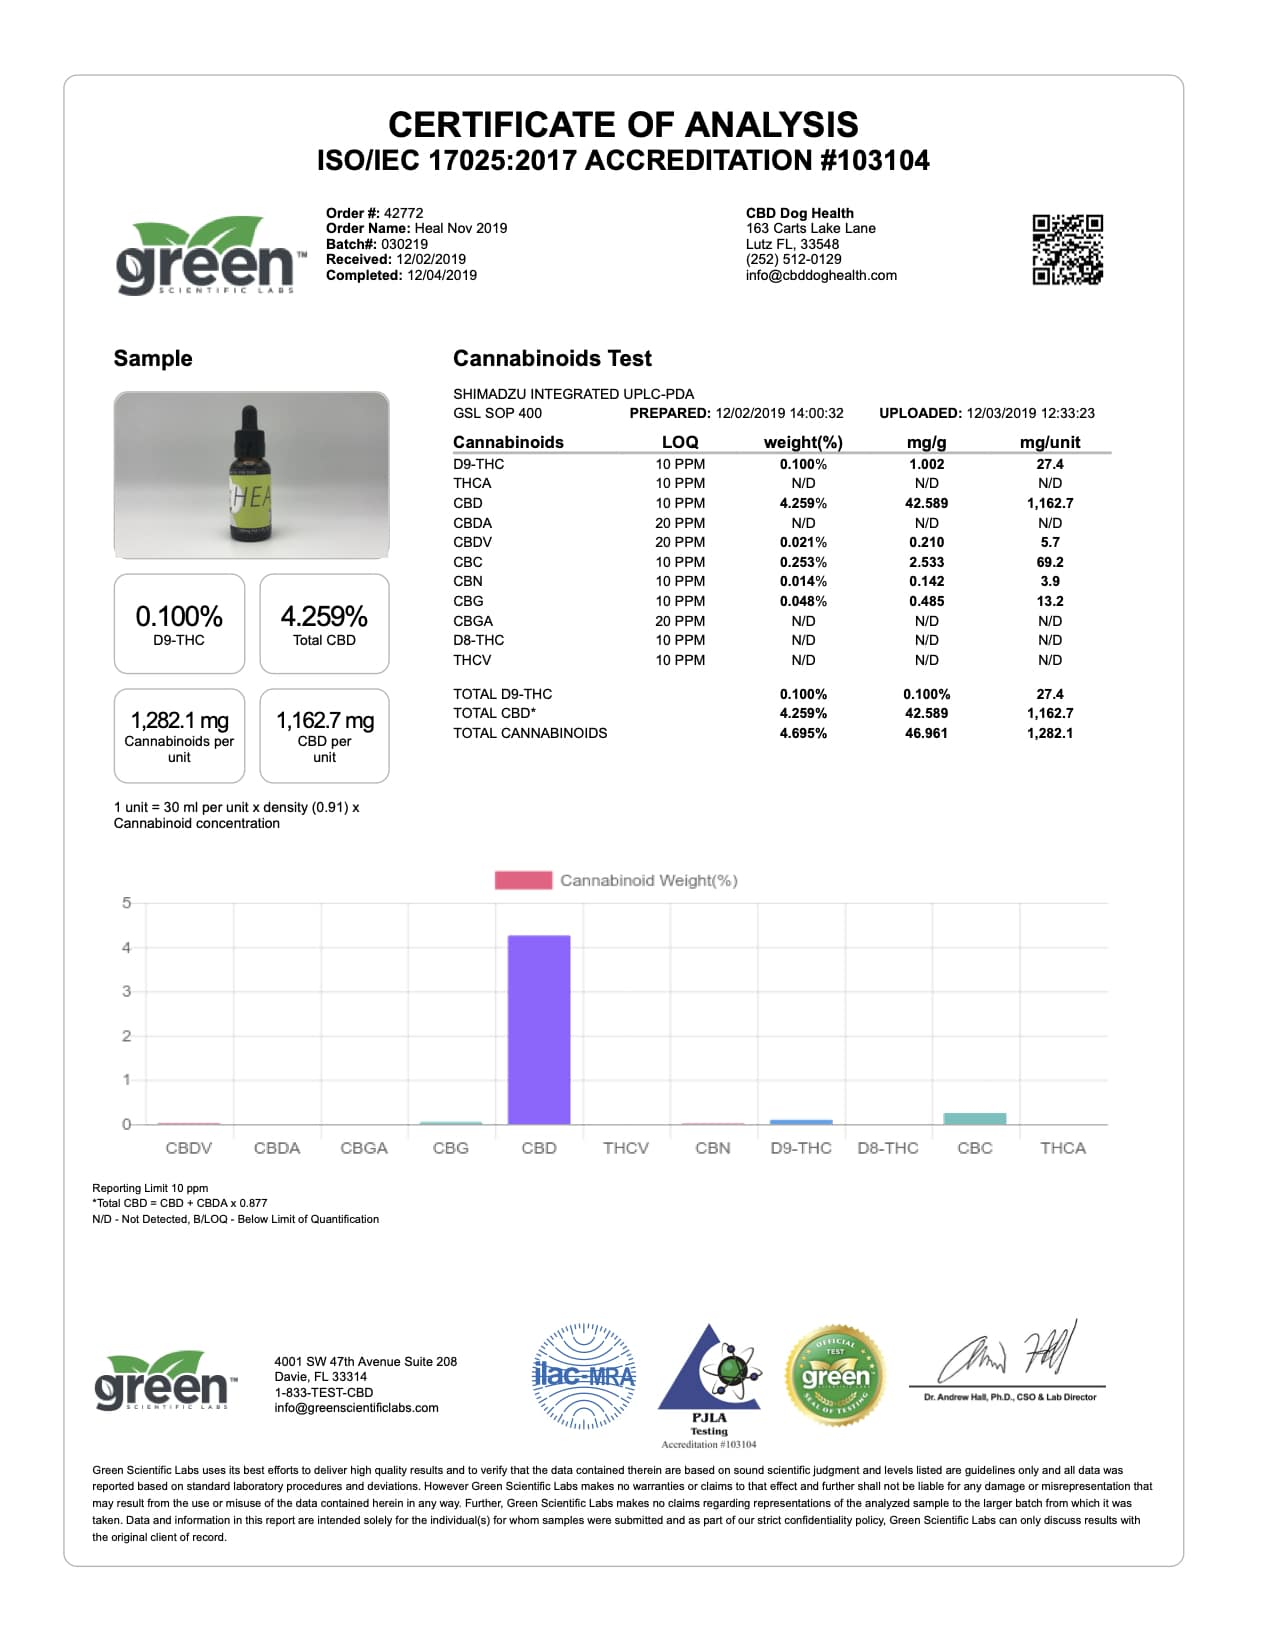 HEAL 1100MG 12 04 19 GreenScientificLabs Batch030219